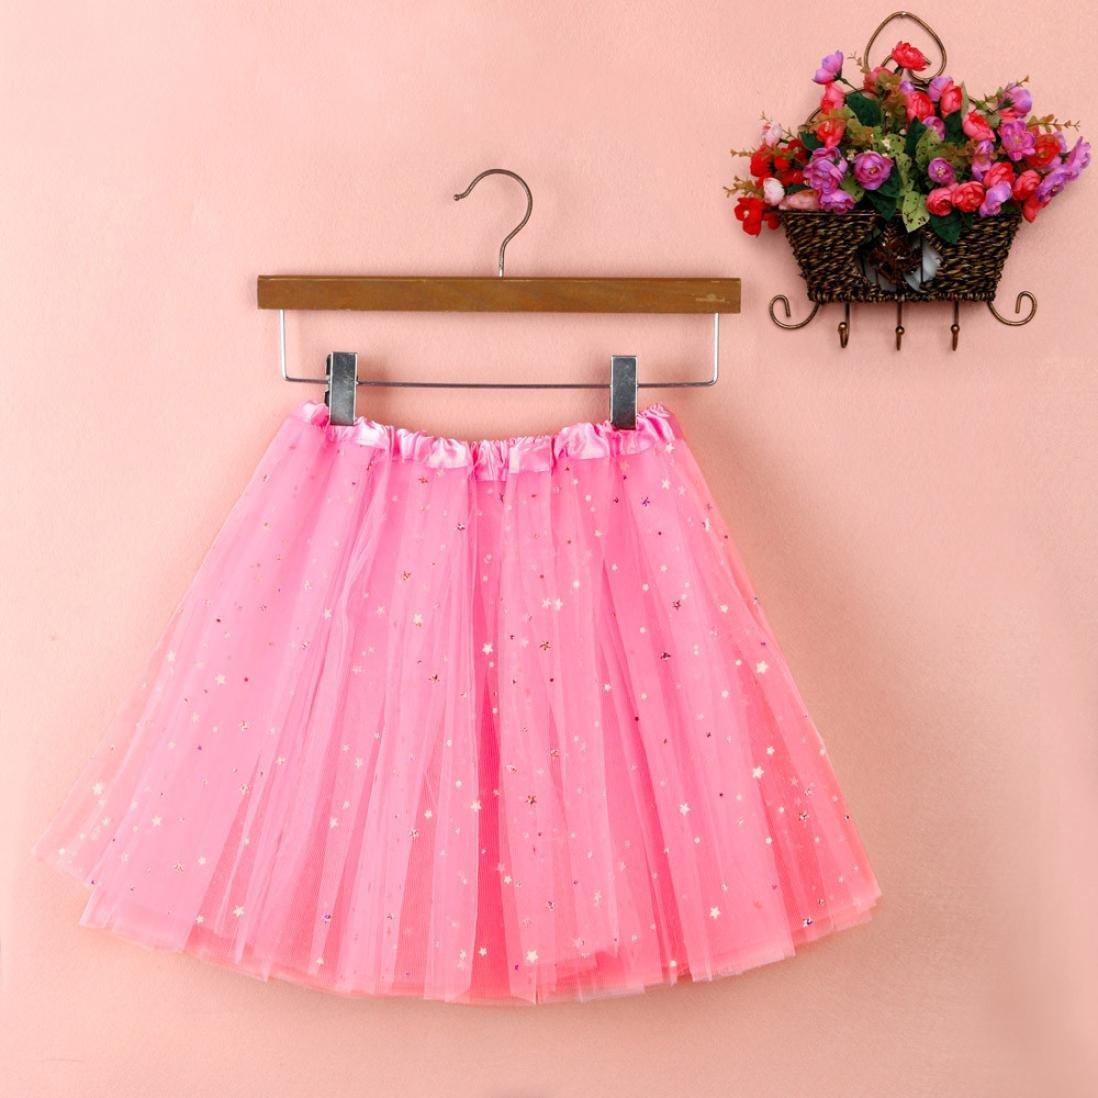 Sinwo Womens Girl Cute Pleated Gauze Short Skirt Adult Tutu Dancing Skirt Basic Skirt (Pink)